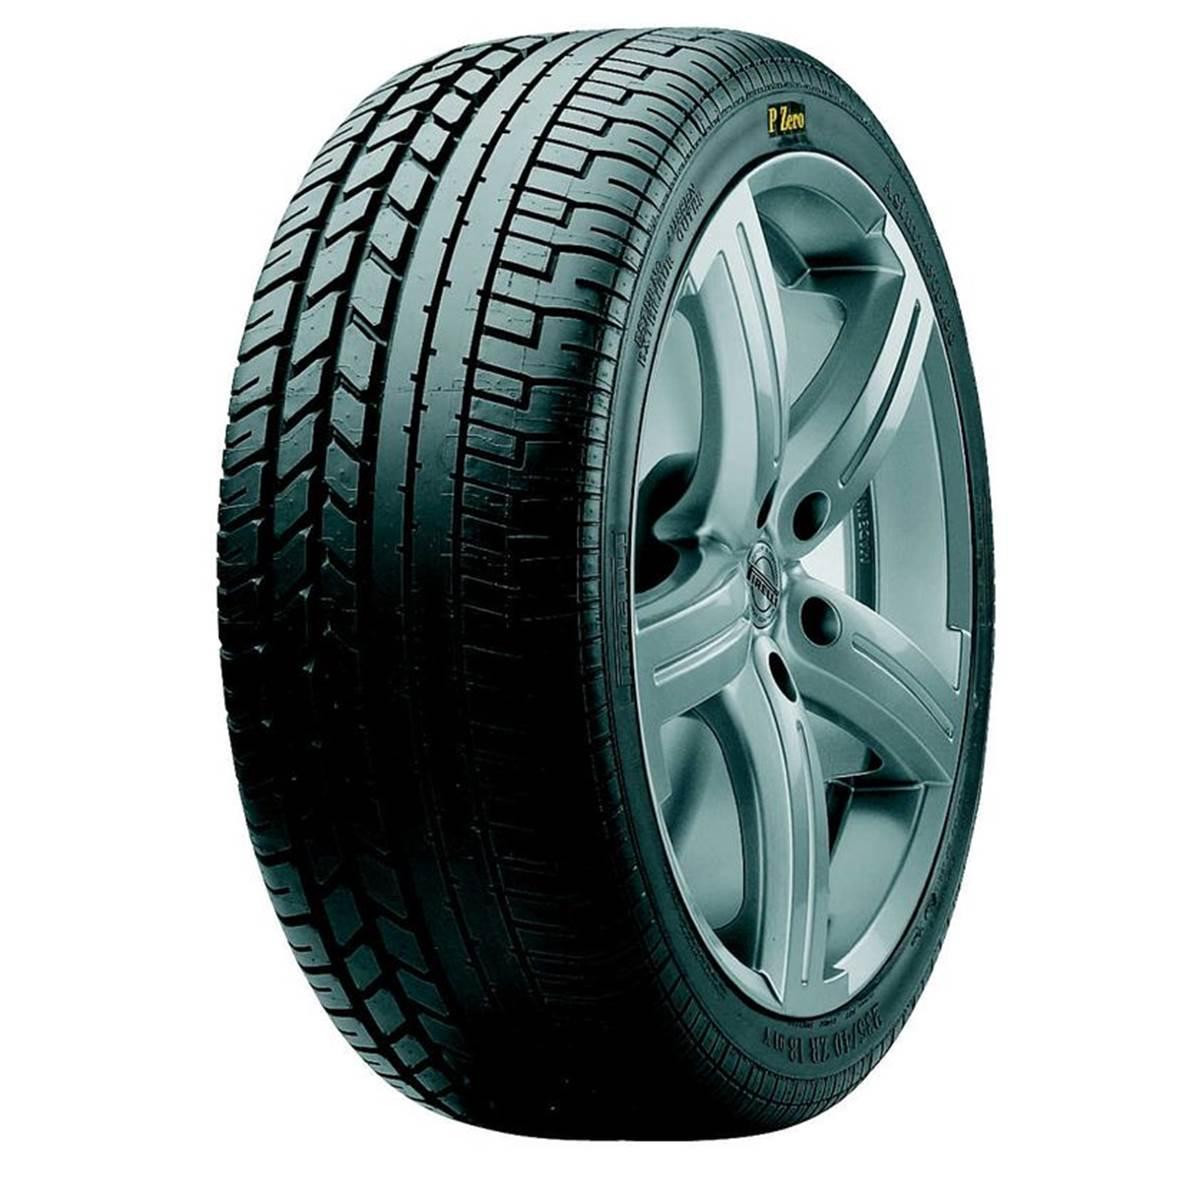 Pneu Pirelli 275/40R18 99Y Pzero Asimmetrico